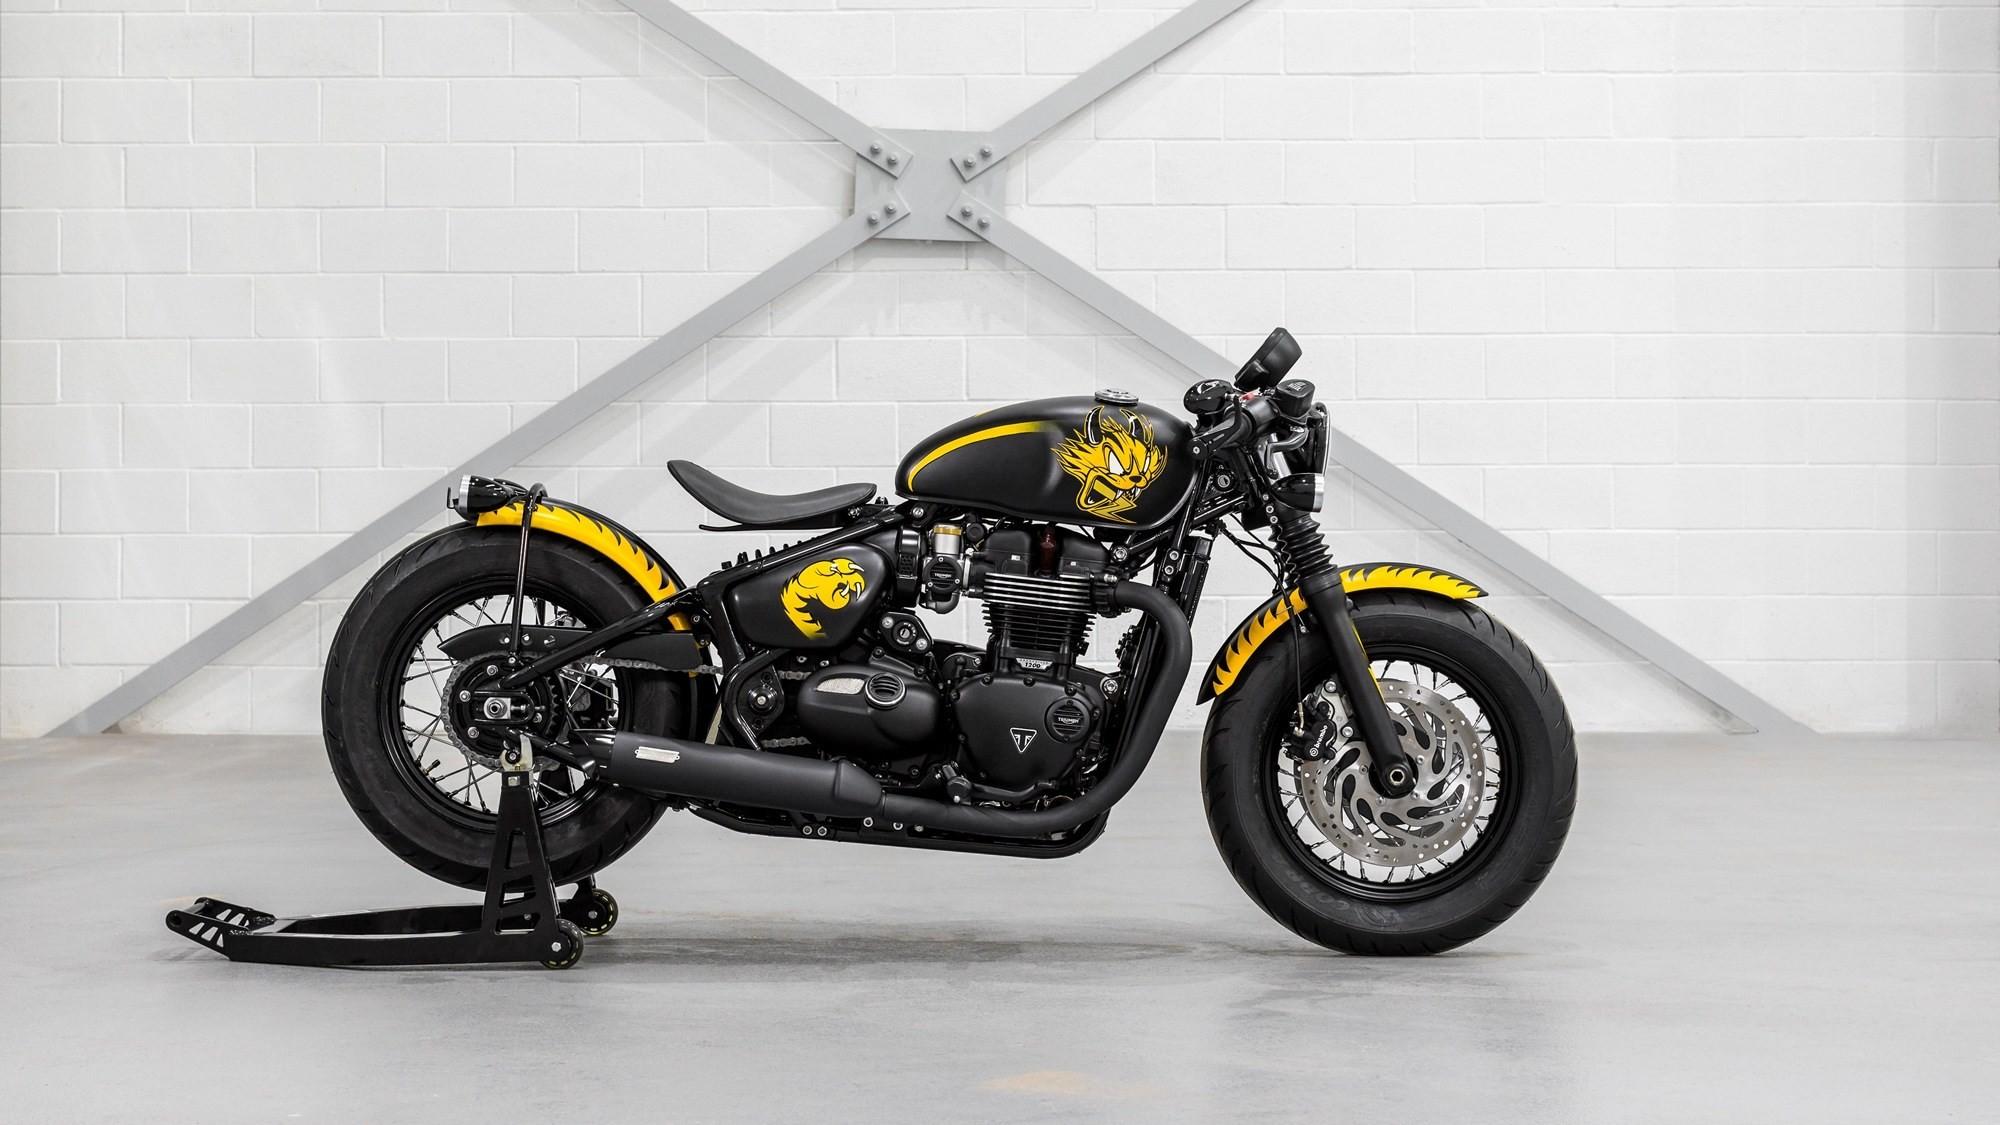 Res: 2000x1125, Triumph Bobber spirit of 59 HD wallpaper